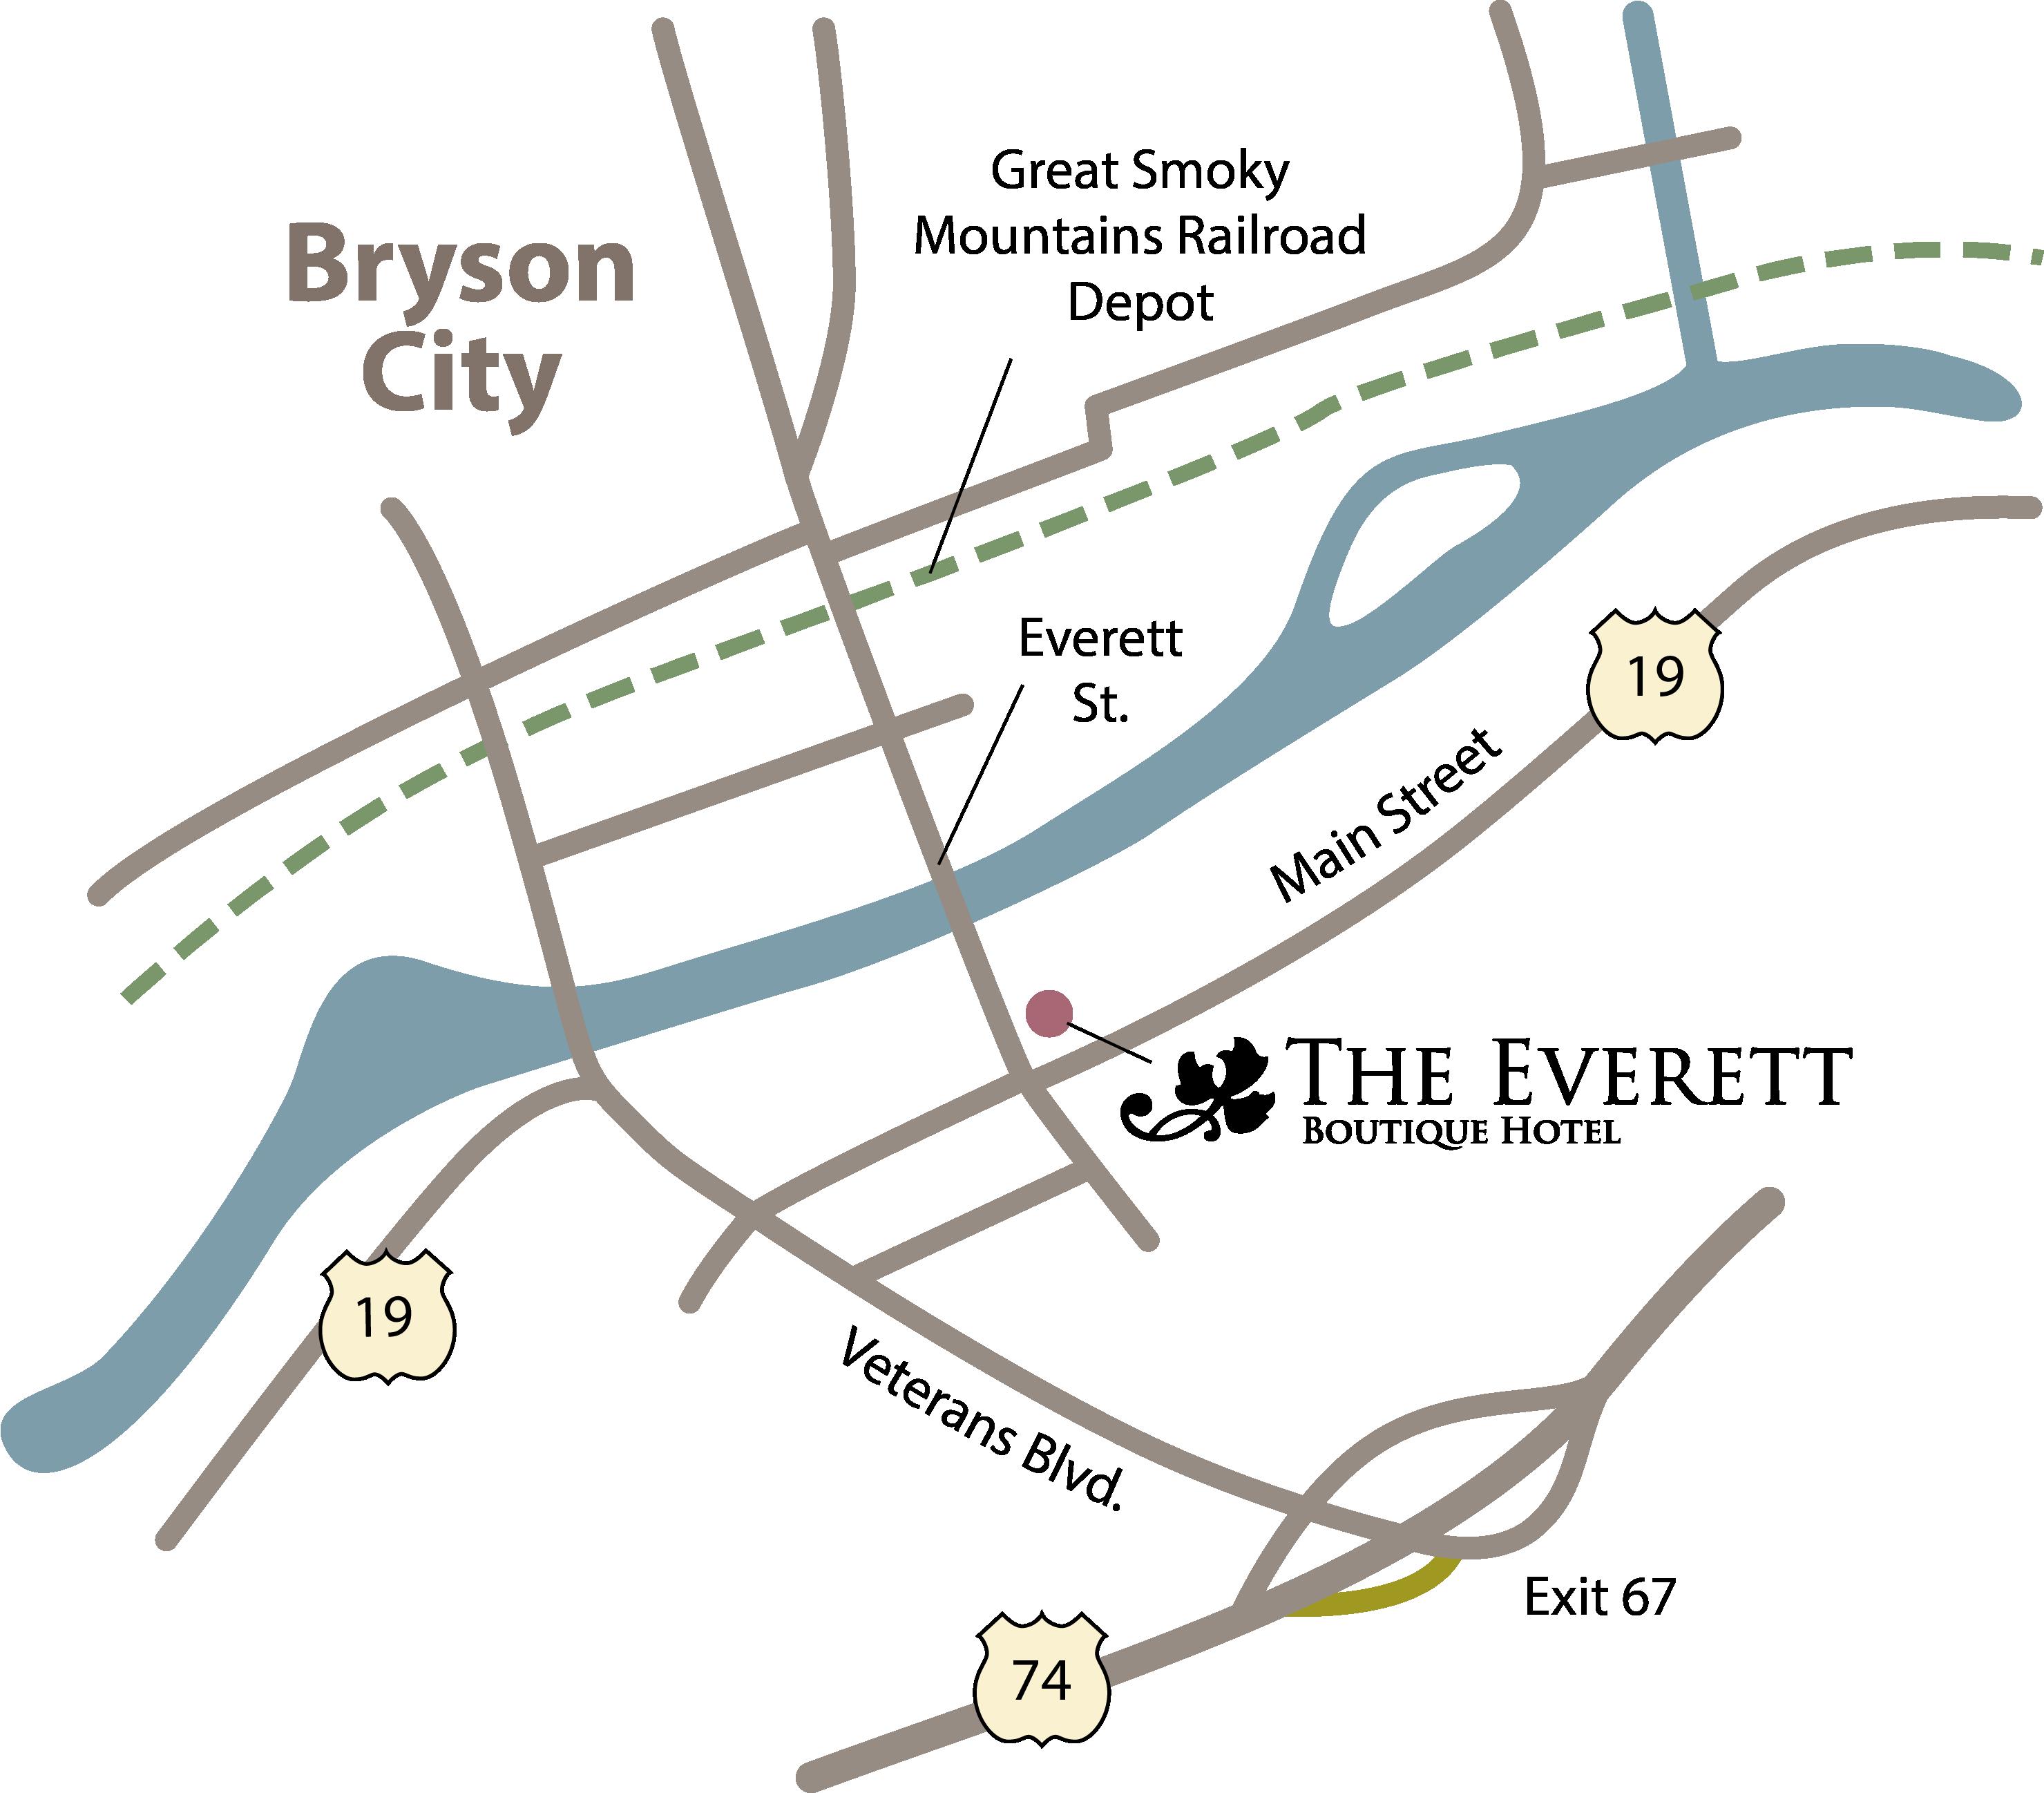 Bryson Nc Map.Hotels In Bryson City Nc Romantic Weekend Getaway From Atlanta